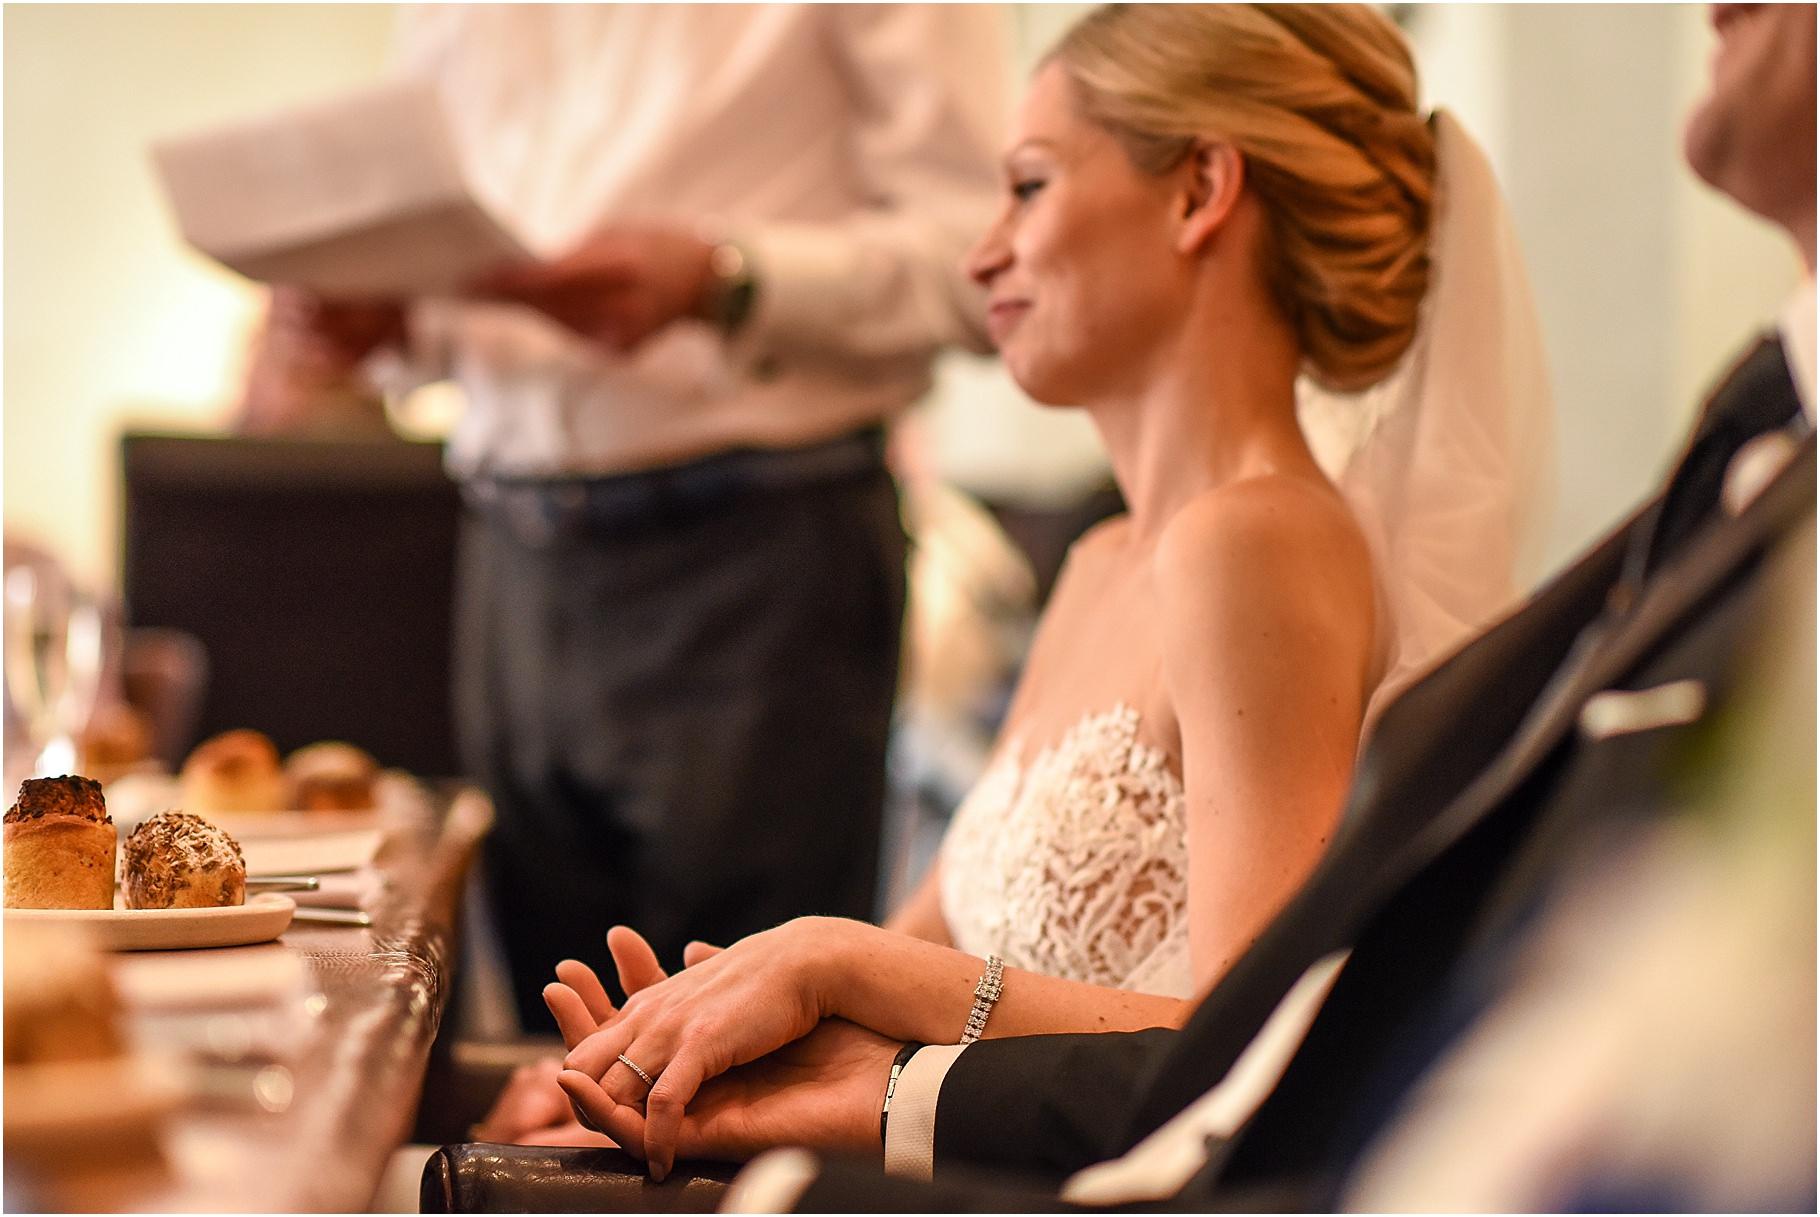 dan-wootton-photography-2017-weddings-150.jpg